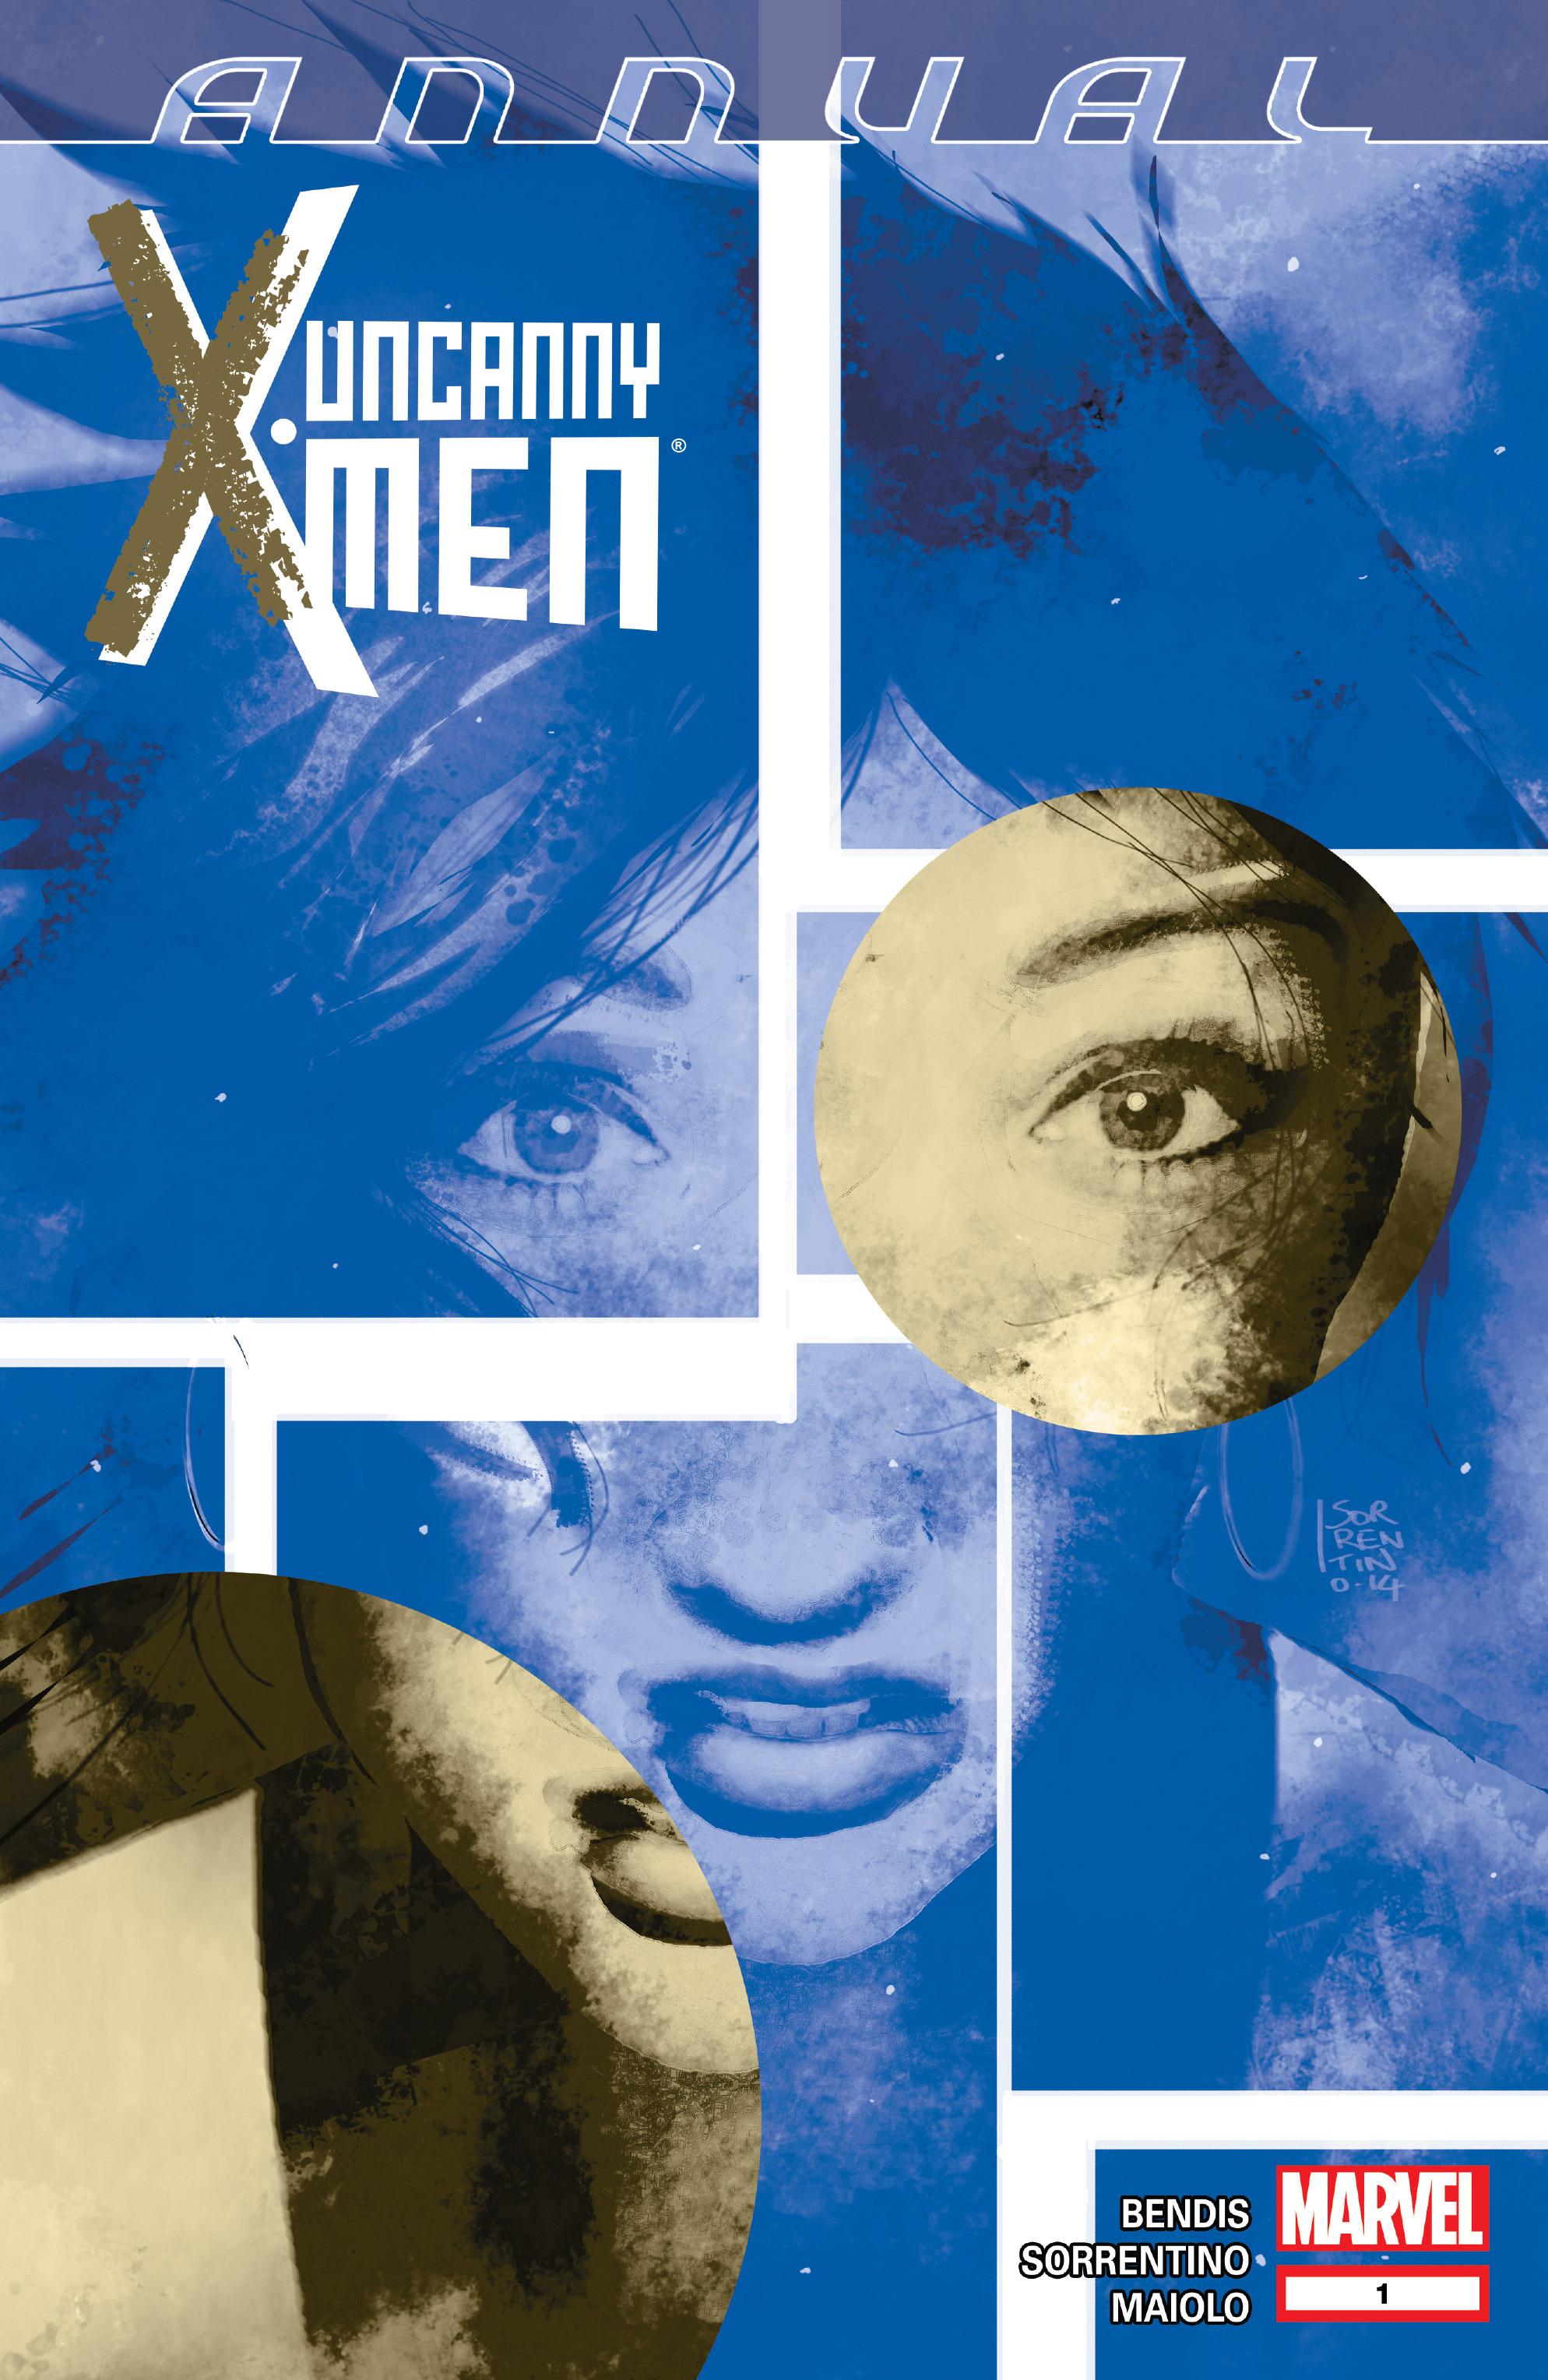 Read online Uncanny X-Men (2013) comic -  Issue # Annual 1 - 1